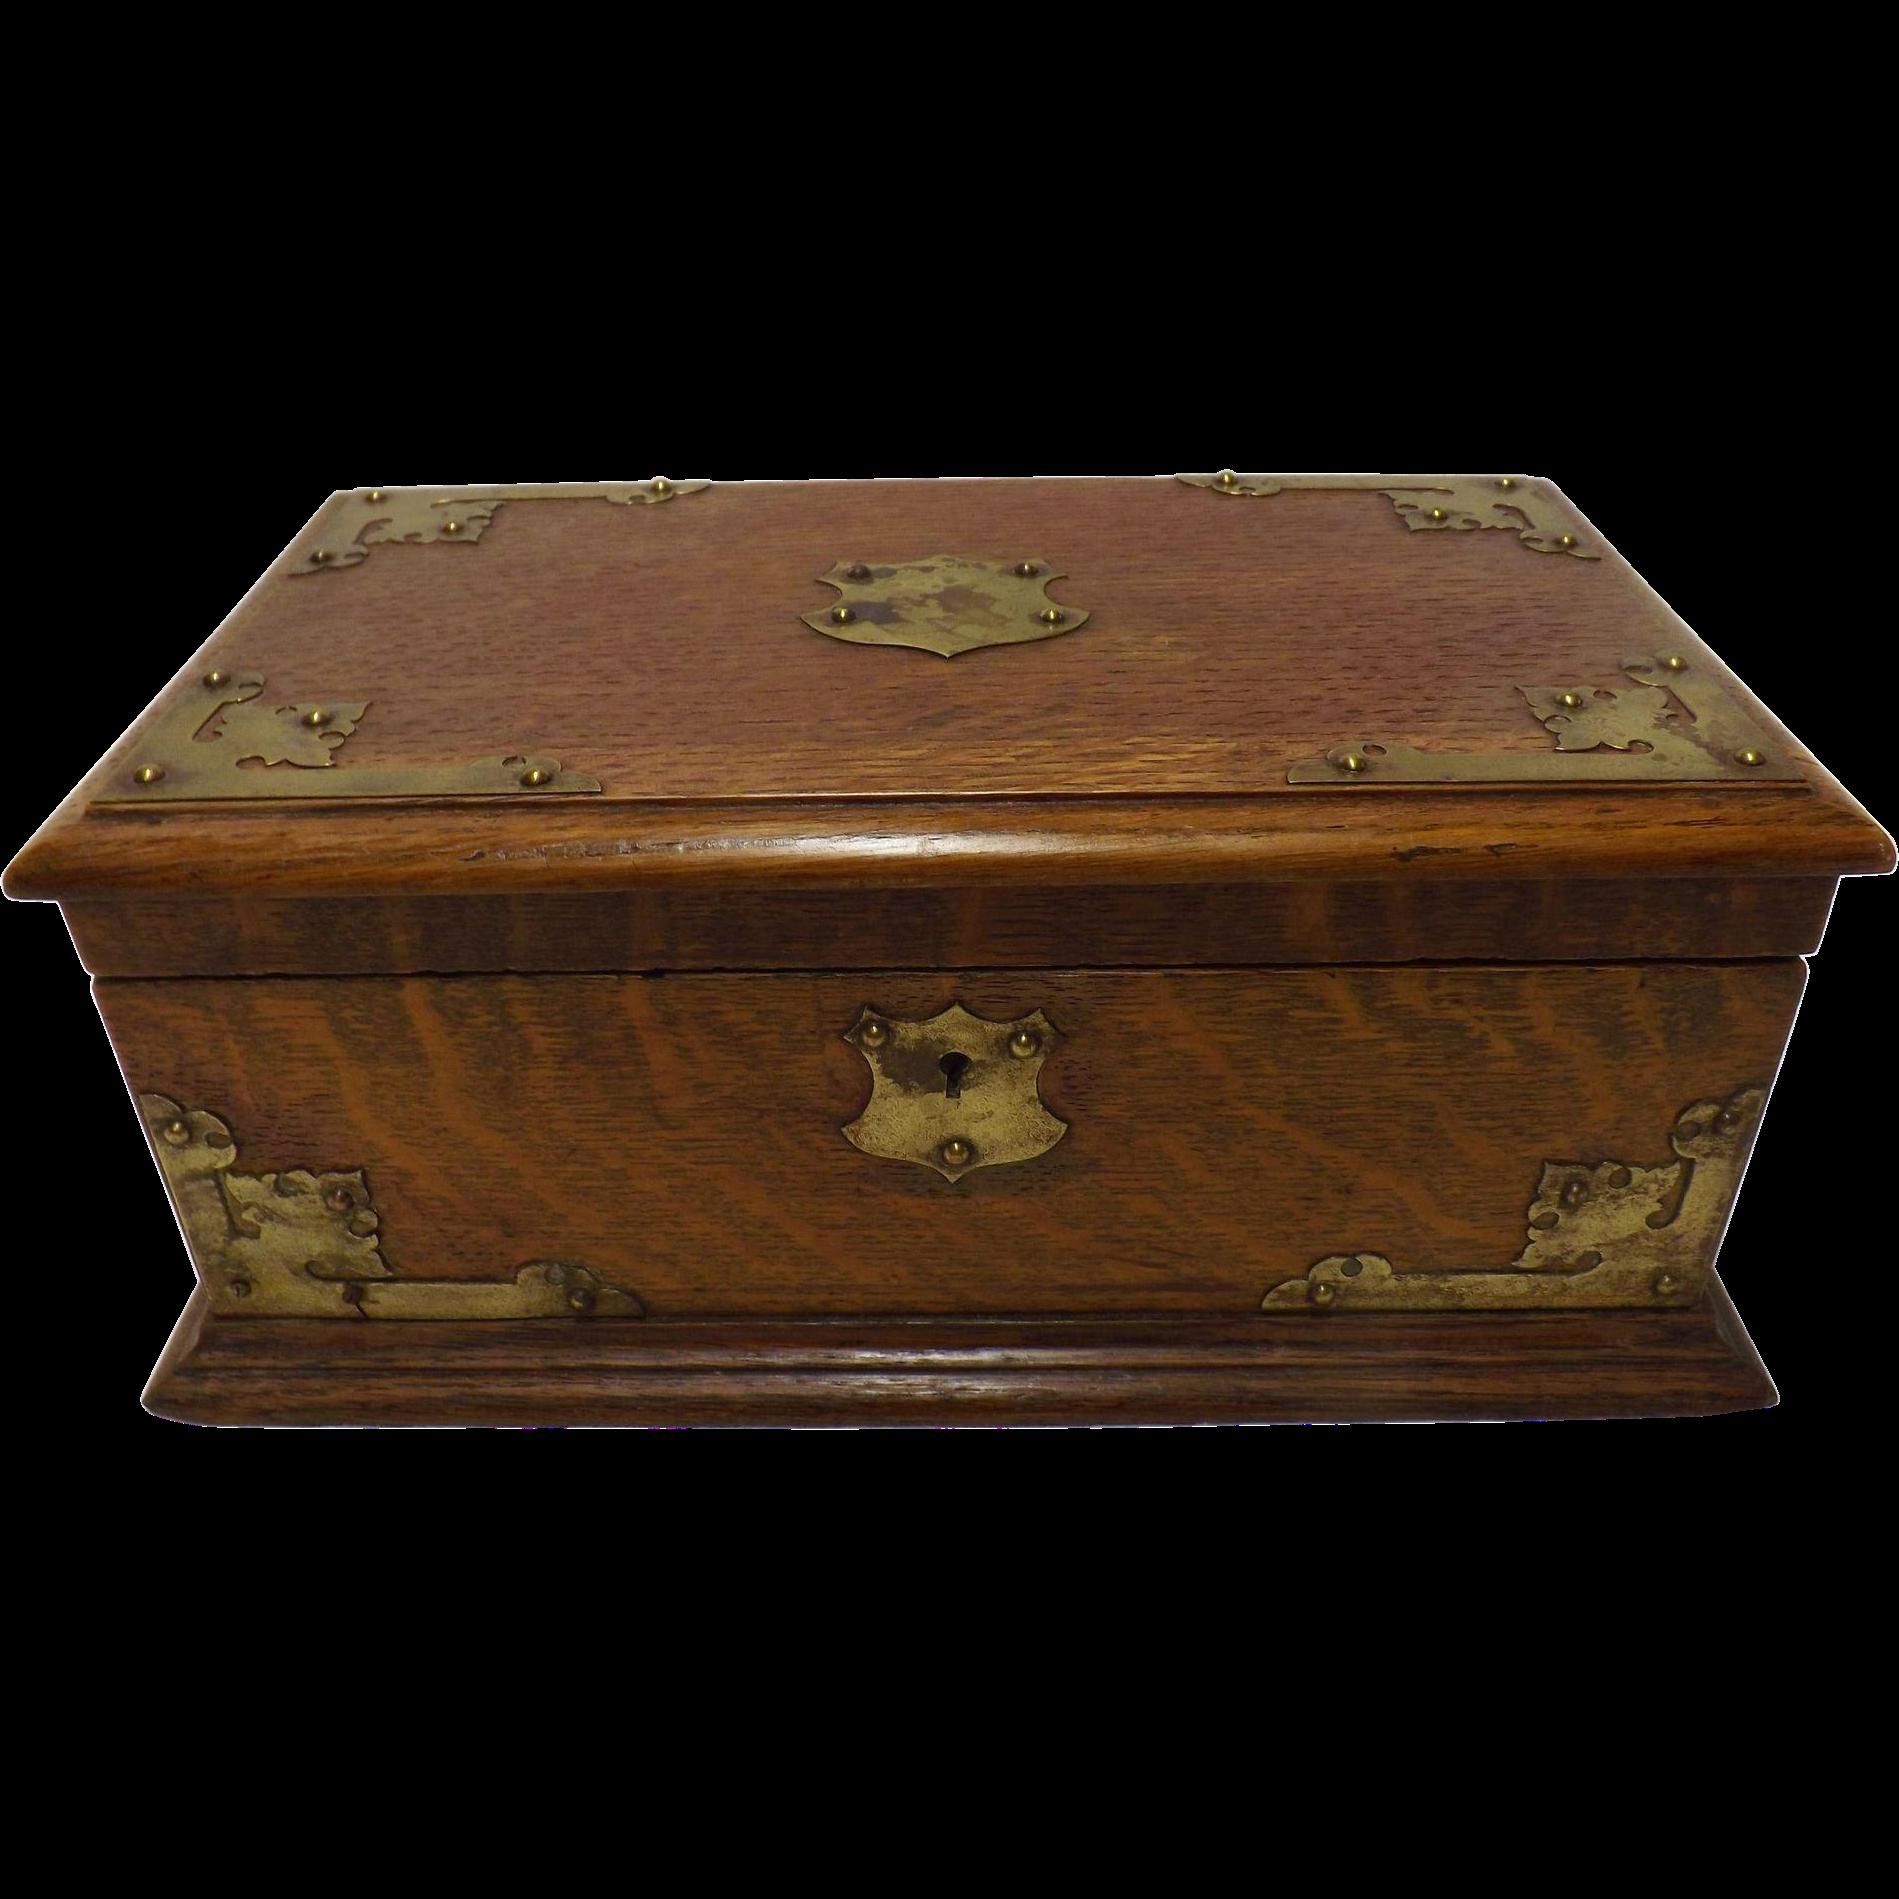 Arts & Crafts Deed Box - Circa 1900